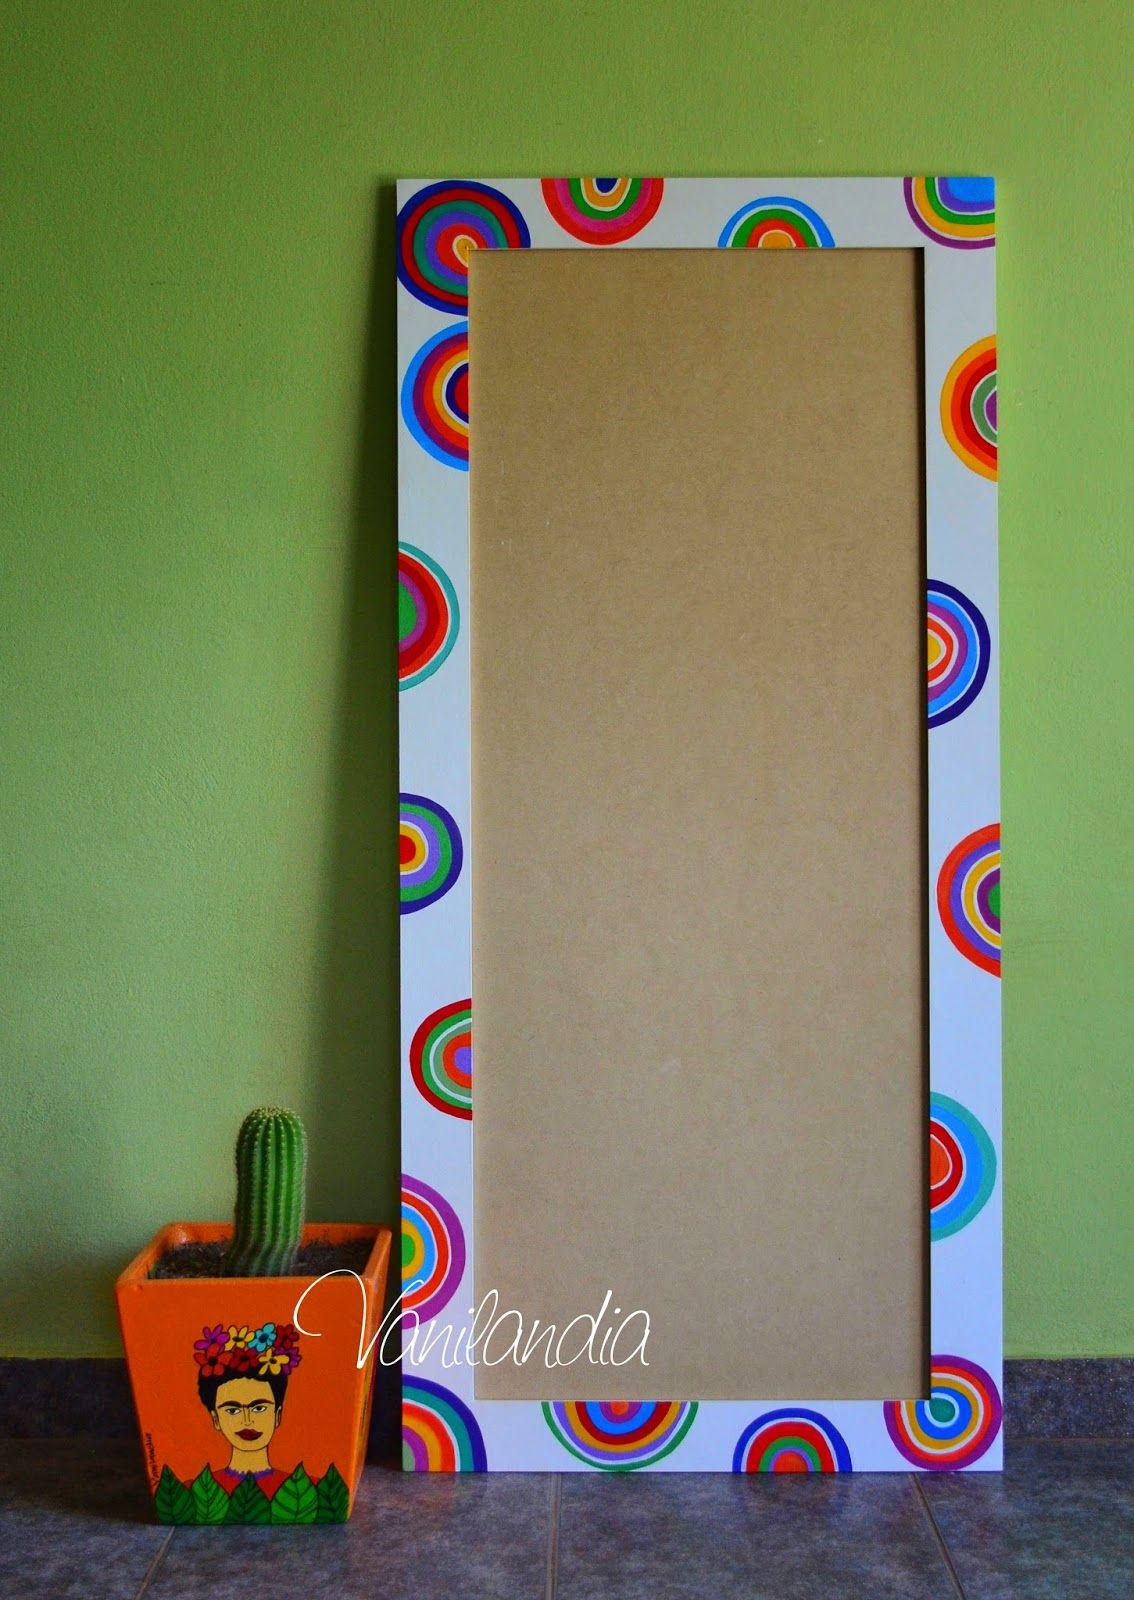 Vanilandia marco pintado para espejo objetos pintados for Marcos de espejos